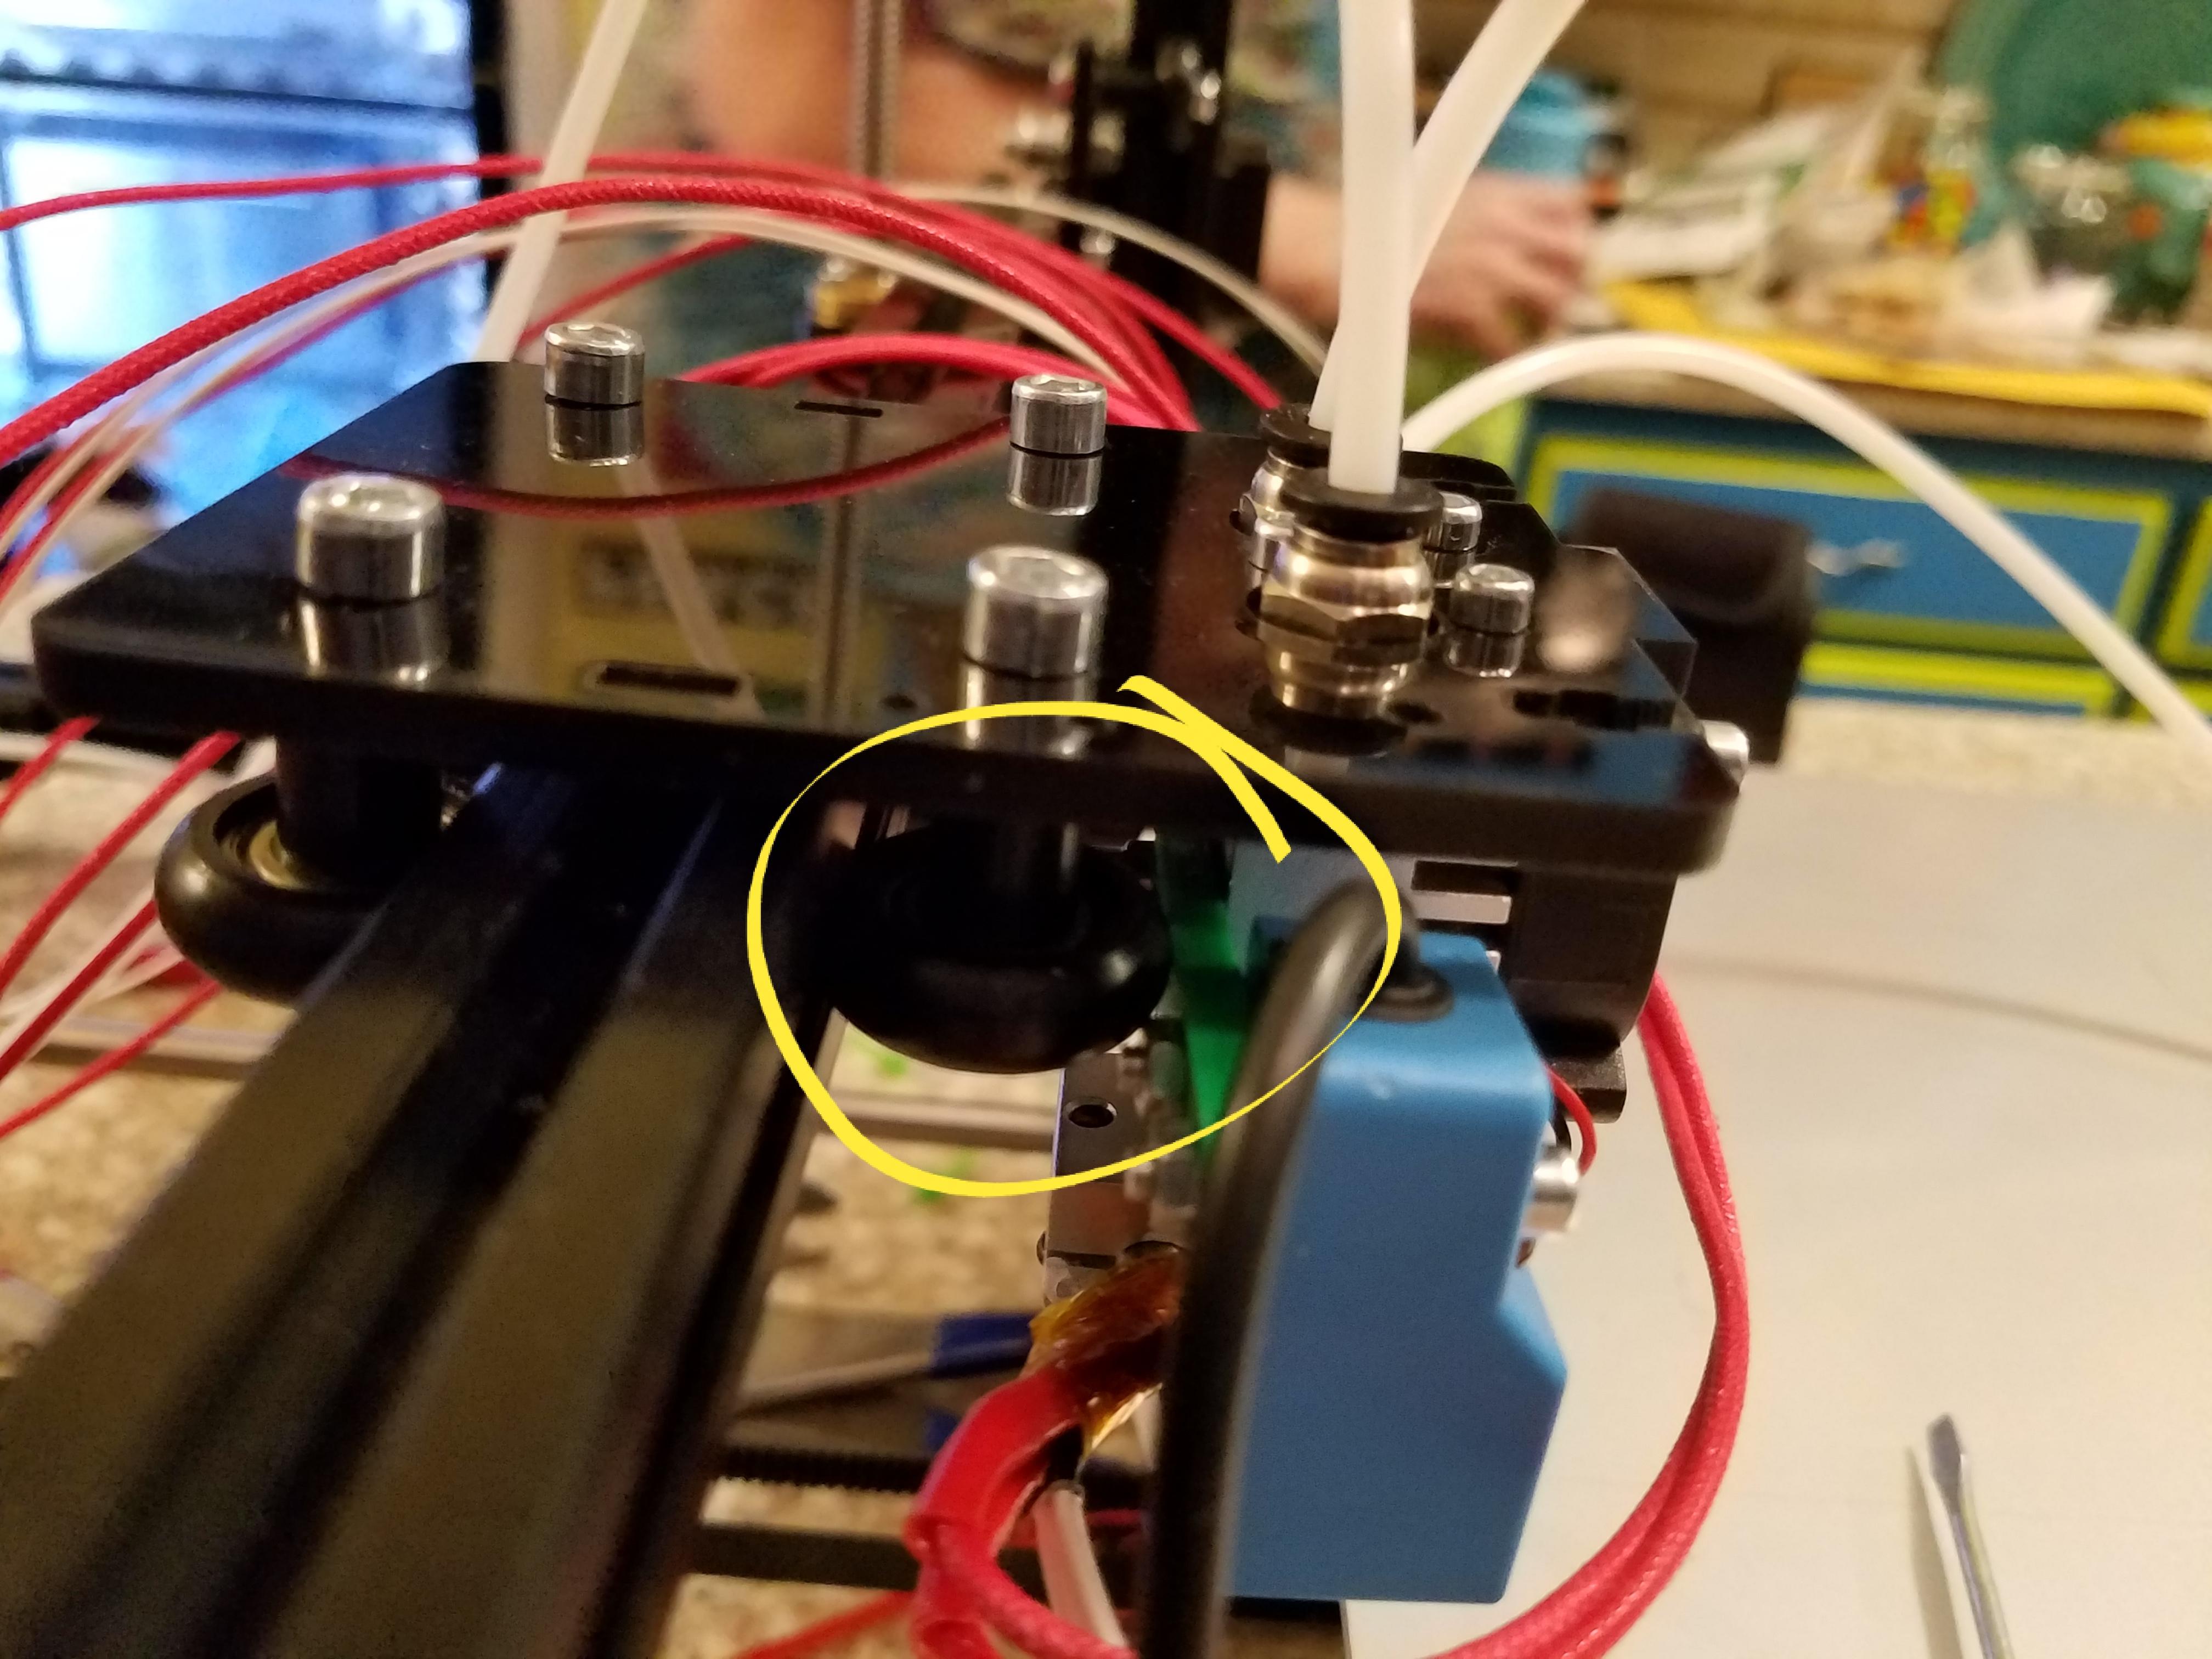 Flsun Dual C Plus Dual Extruder build - 3D Printing / 3D ... on